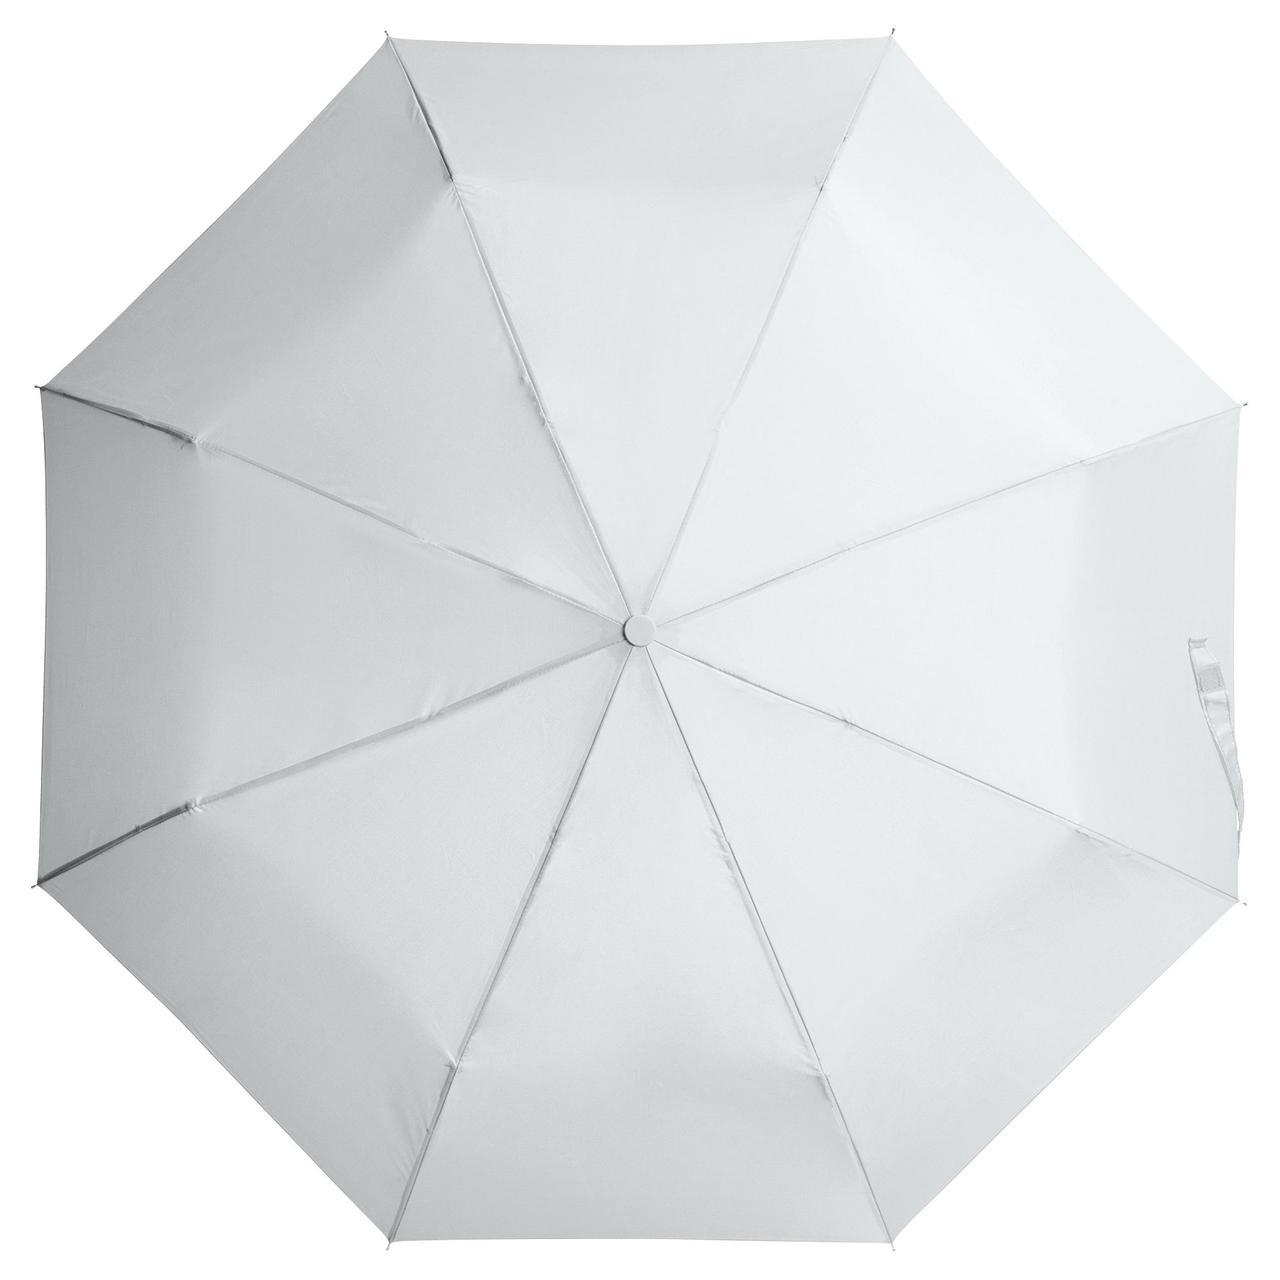 Зонт складной Unit Basic, белый (артикул 5527.66)